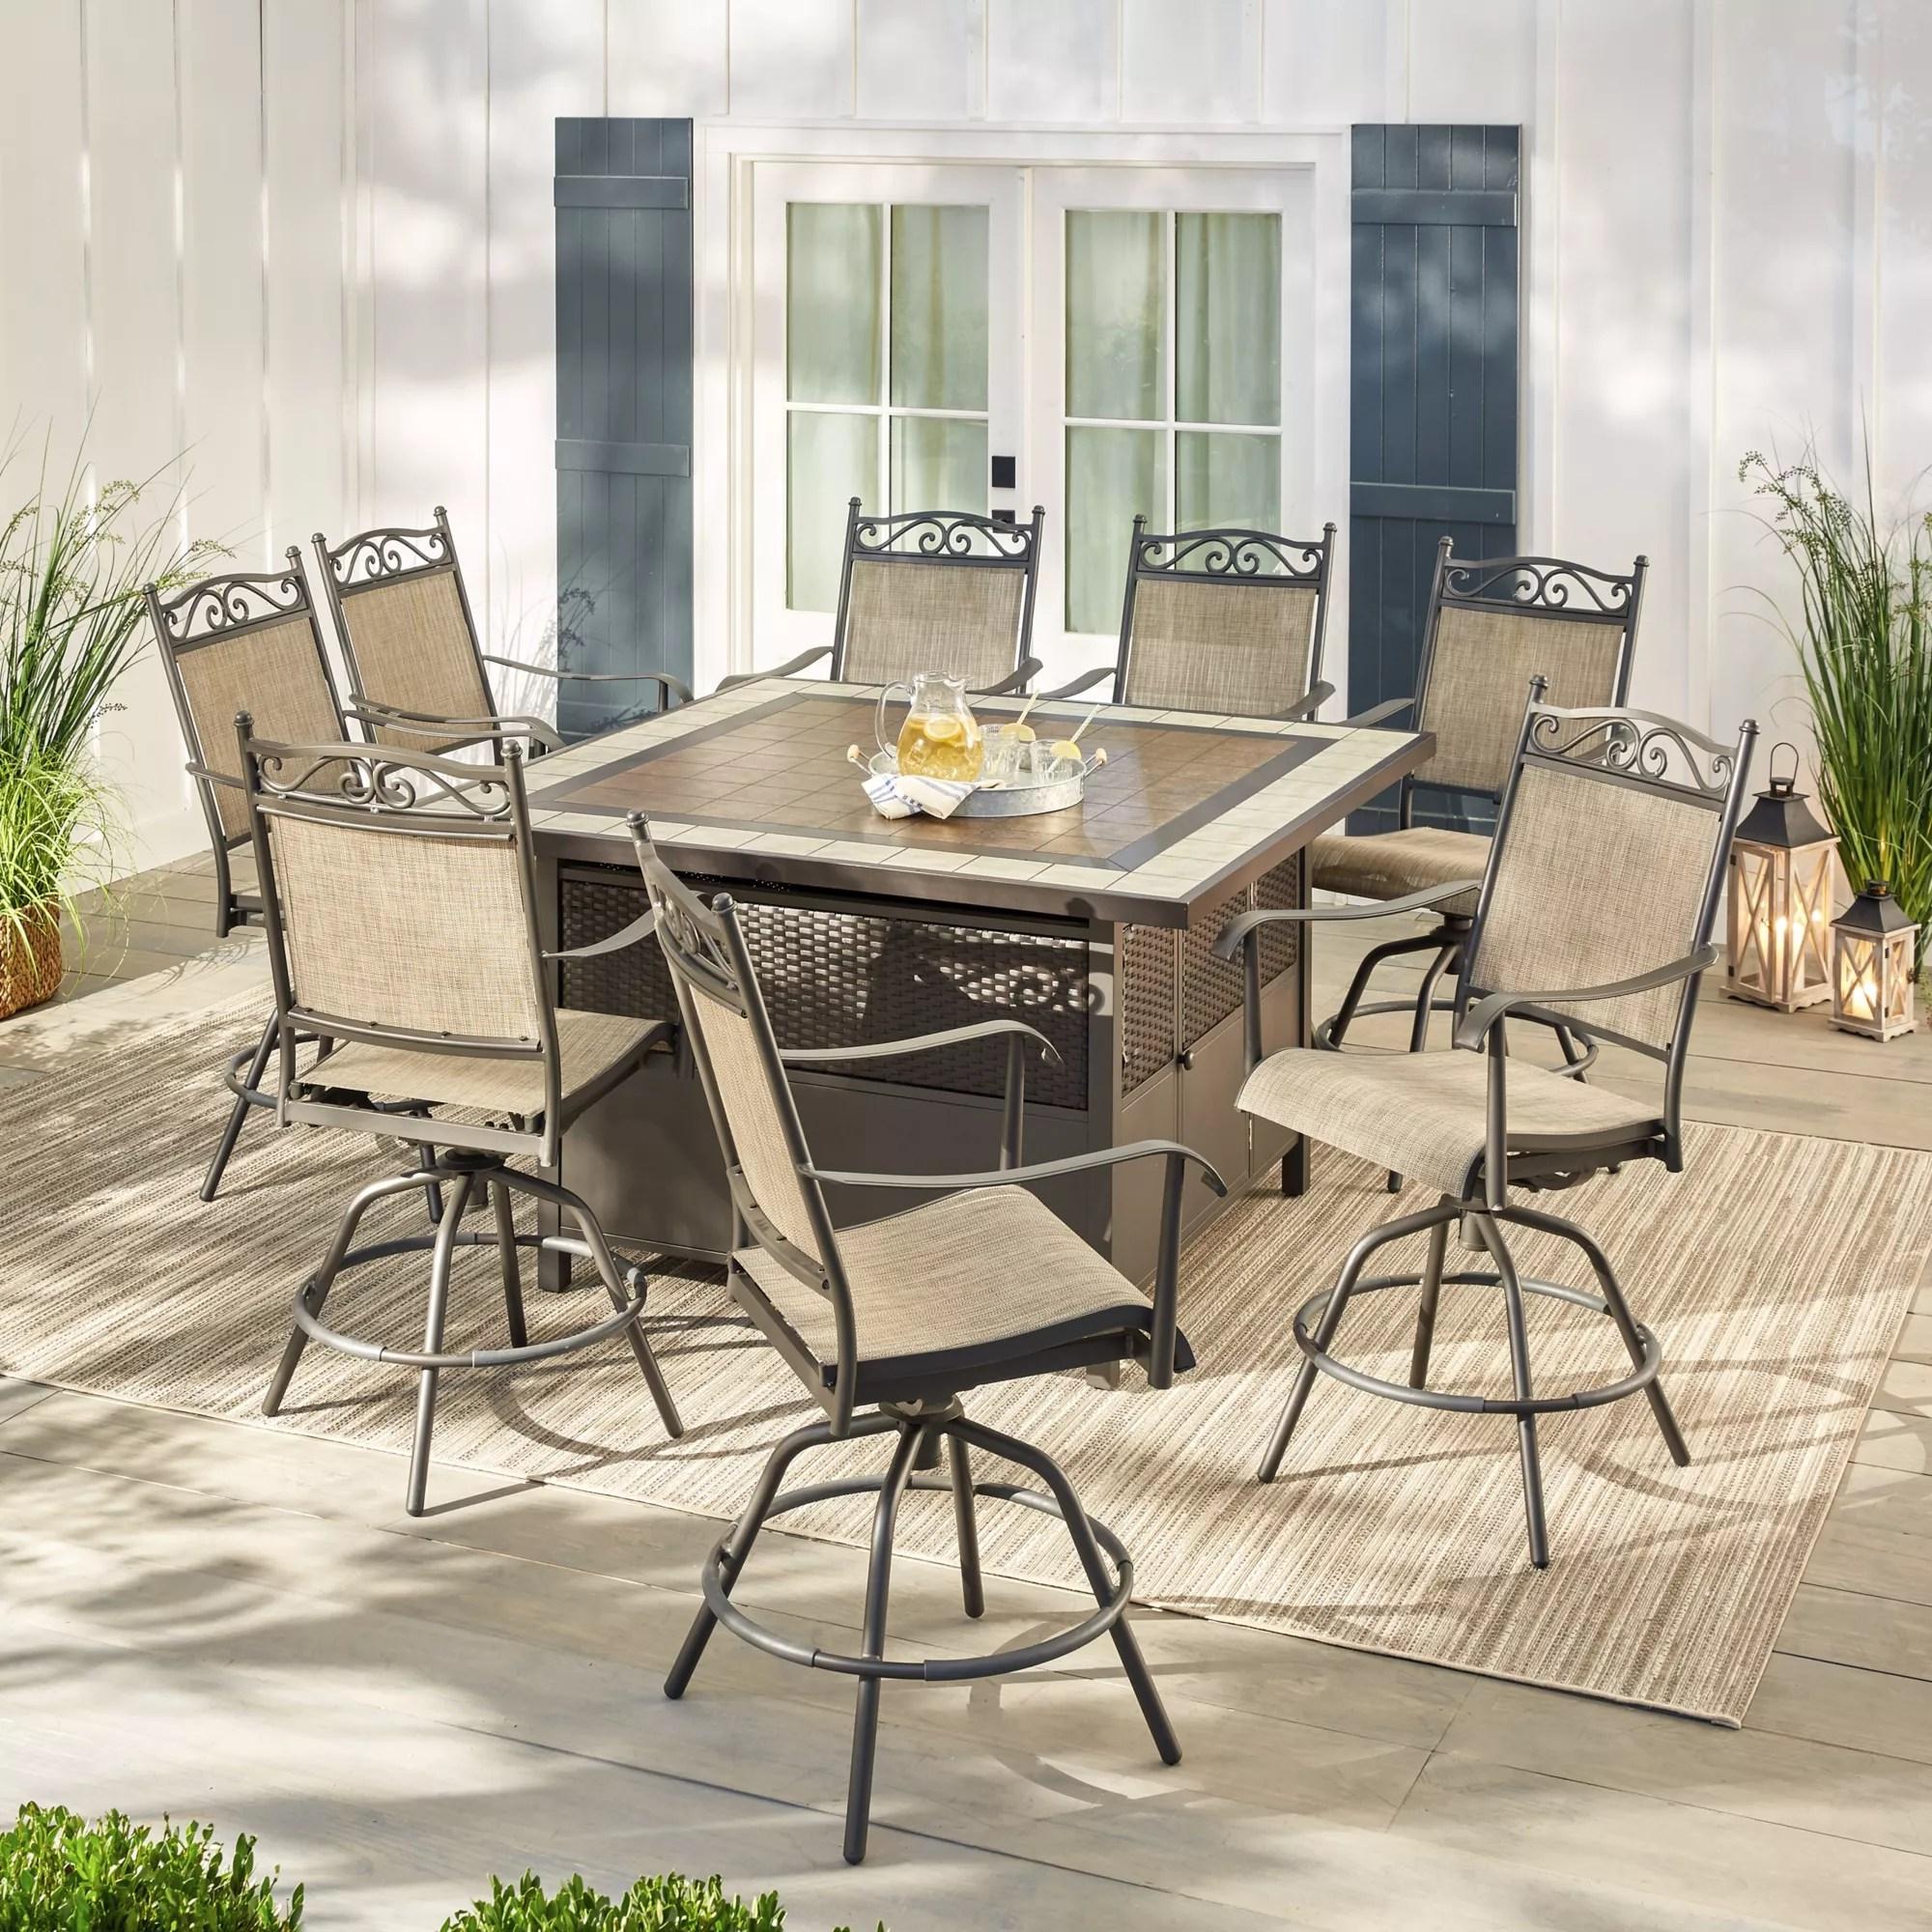 berkley jensen venice 9pc aluminum high dining set with table storage